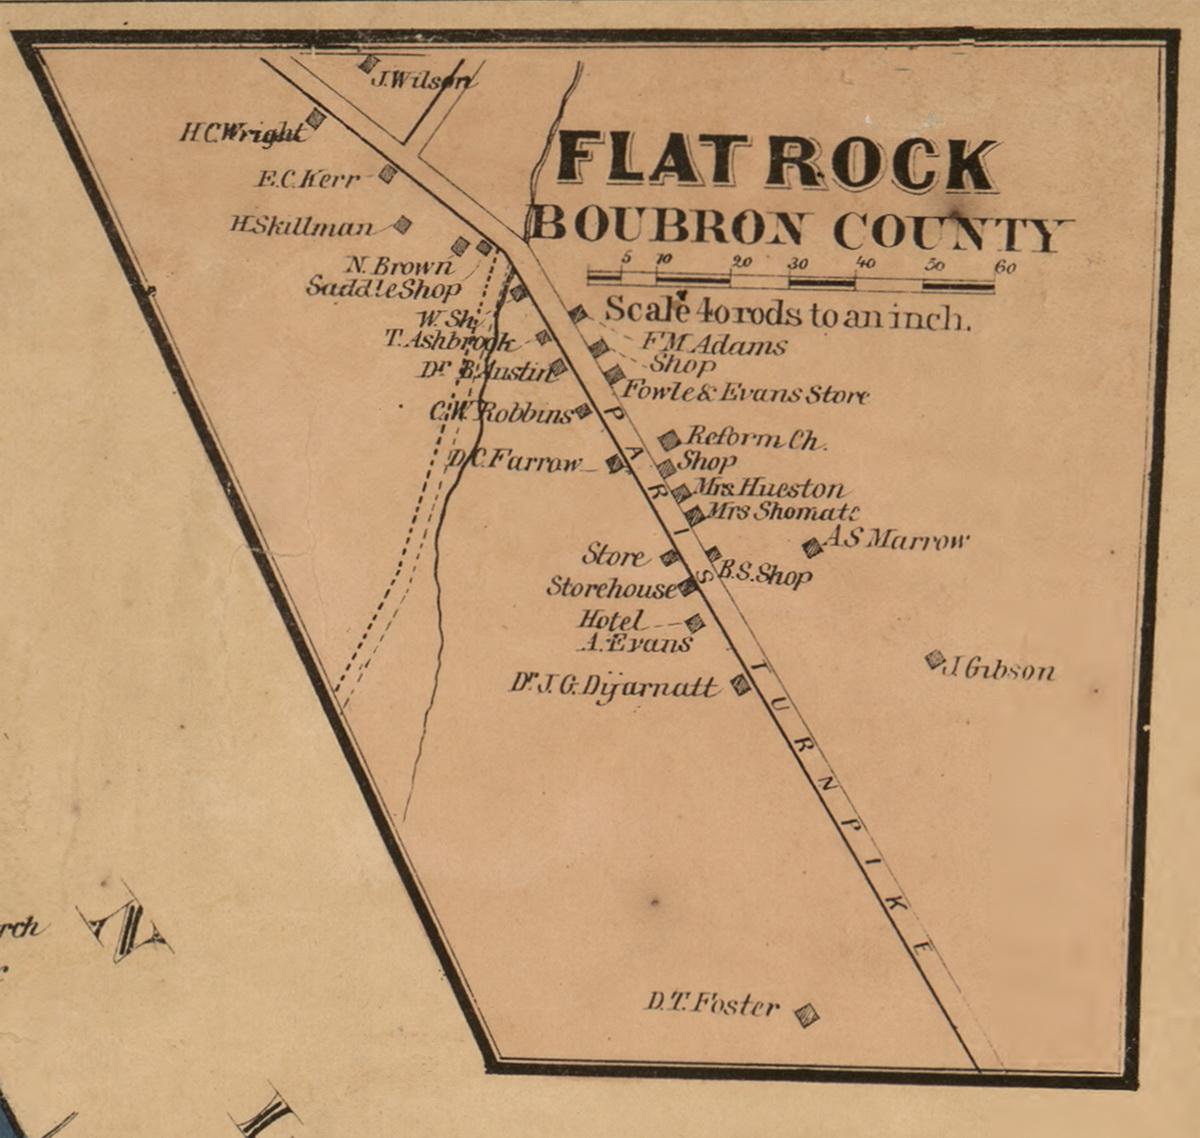 Flat Rock Bourbon County Kentucky 1861 Old Town Map Custom Print Bourbon Co Old Maps